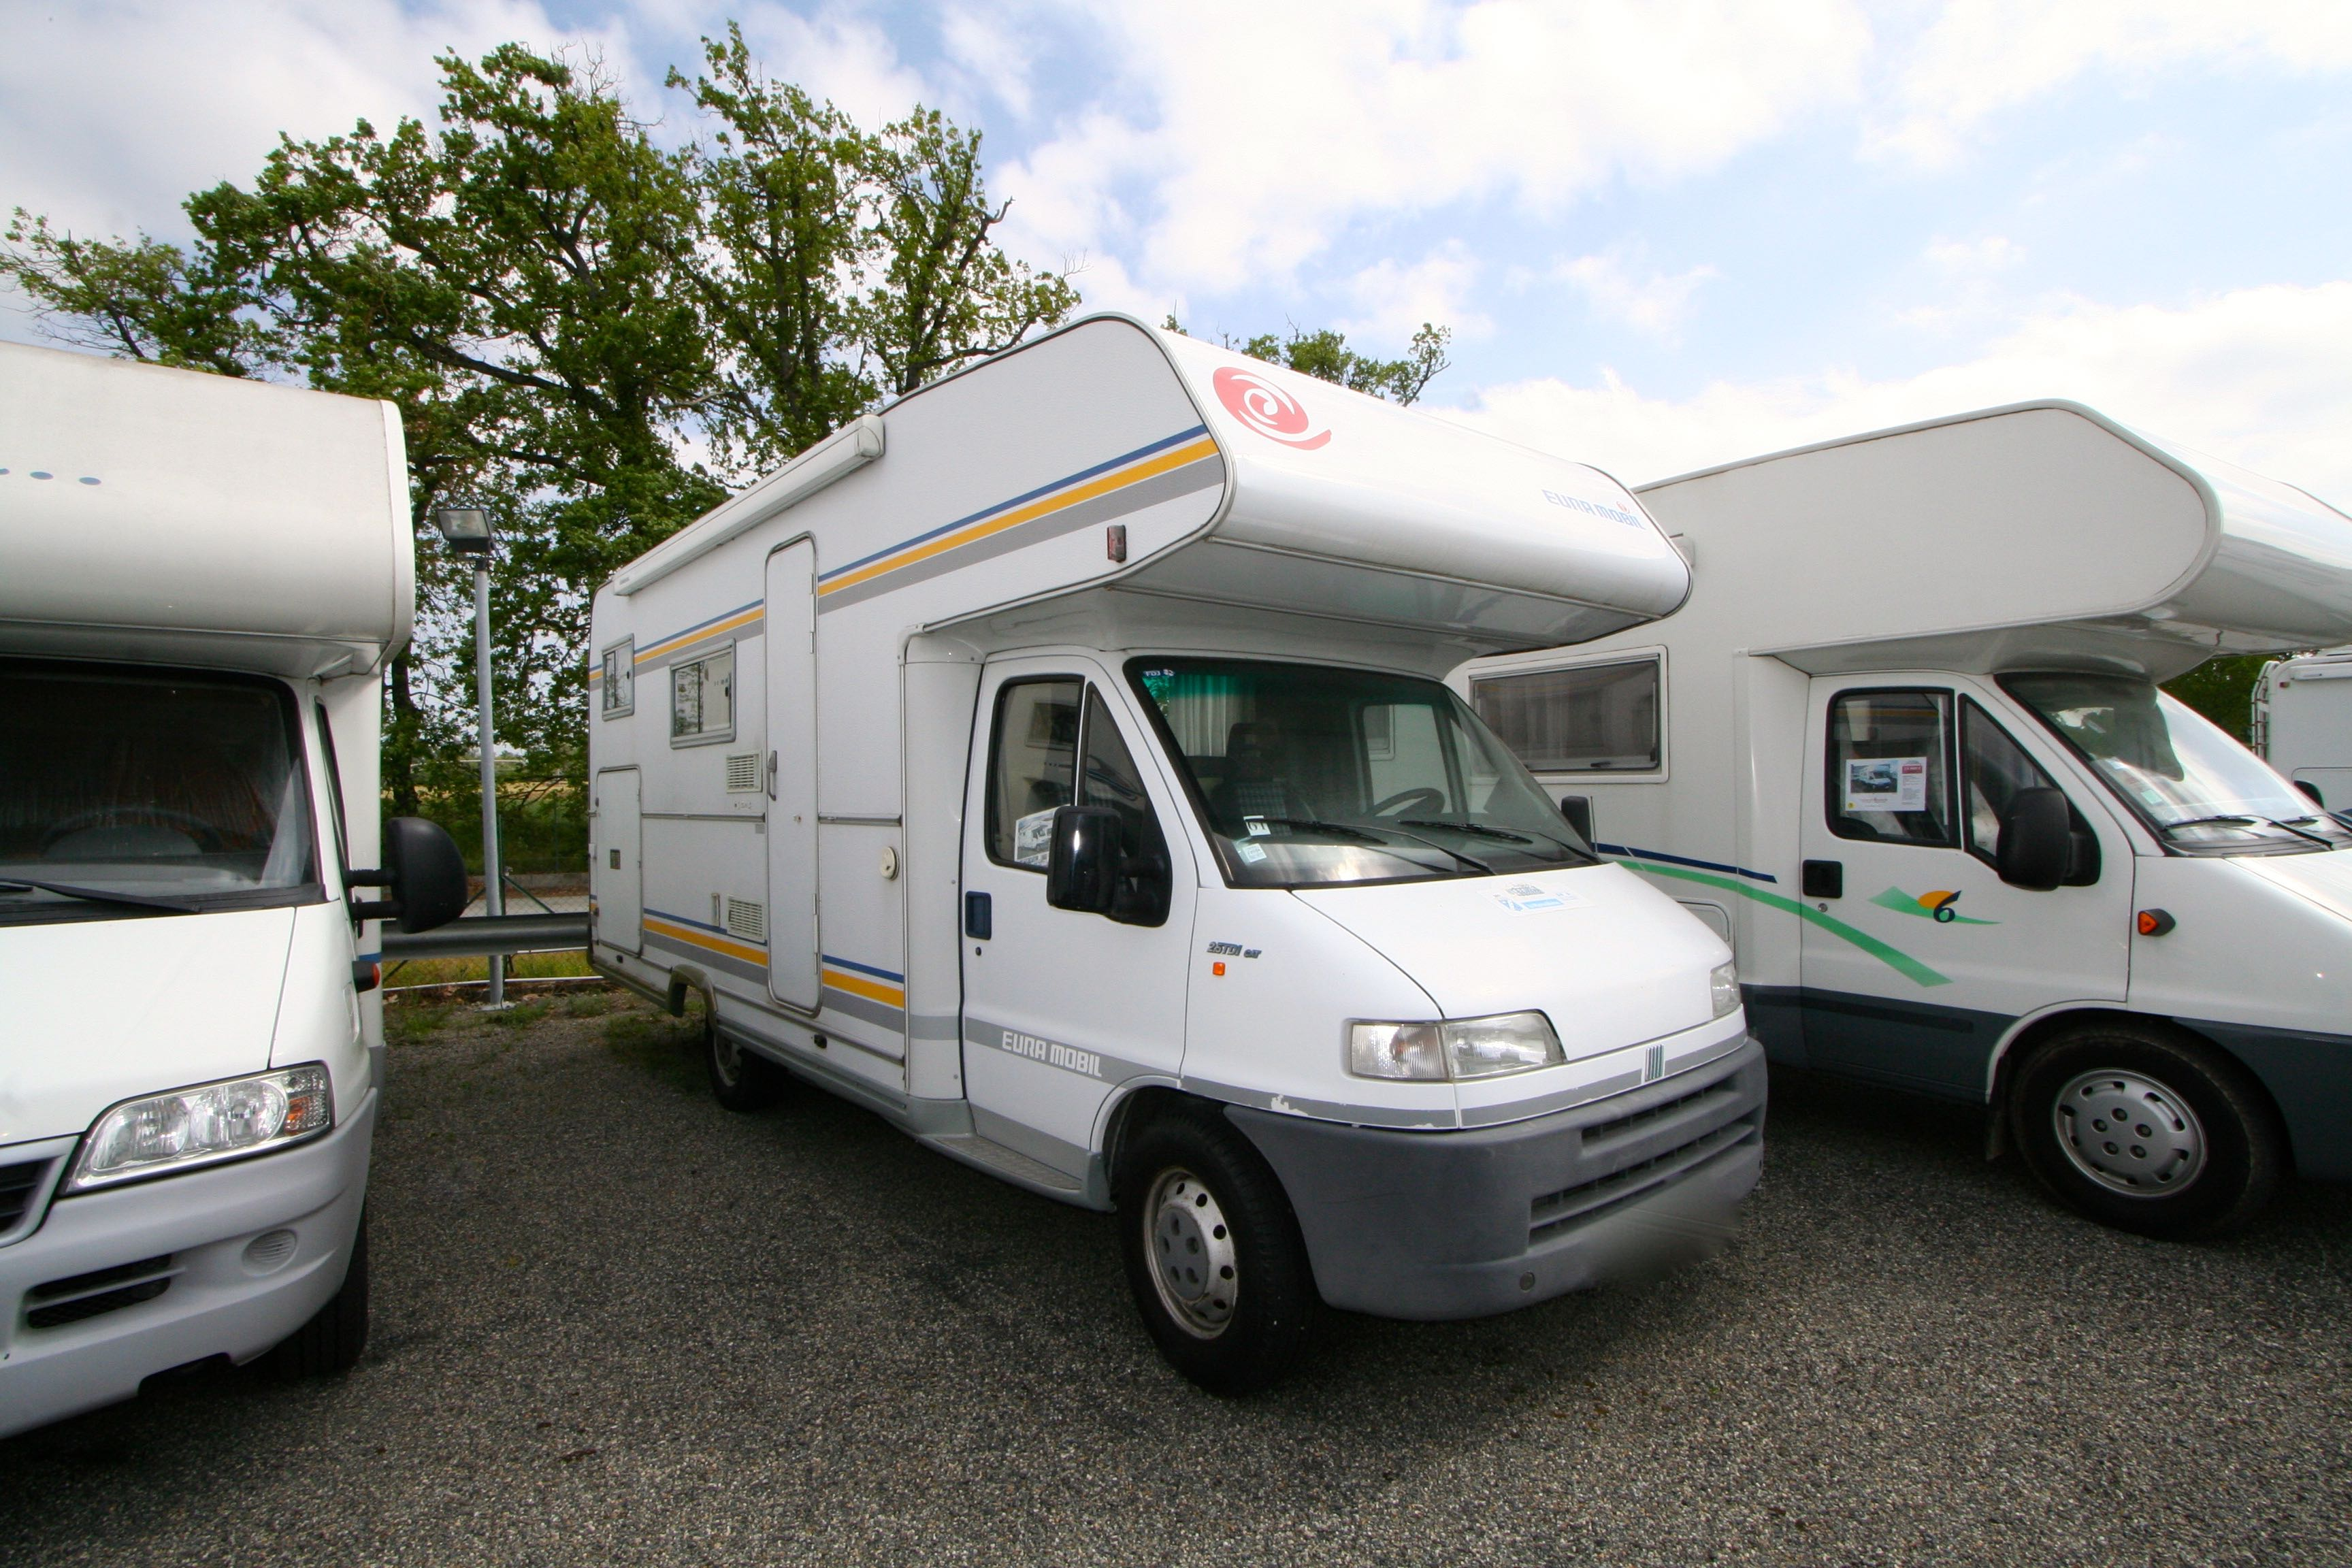 eura mobil activa 690 hb occasion de 2001 fiat camping car en vente roques sur garonne. Black Bedroom Furniture Sets. Home Design Ideas